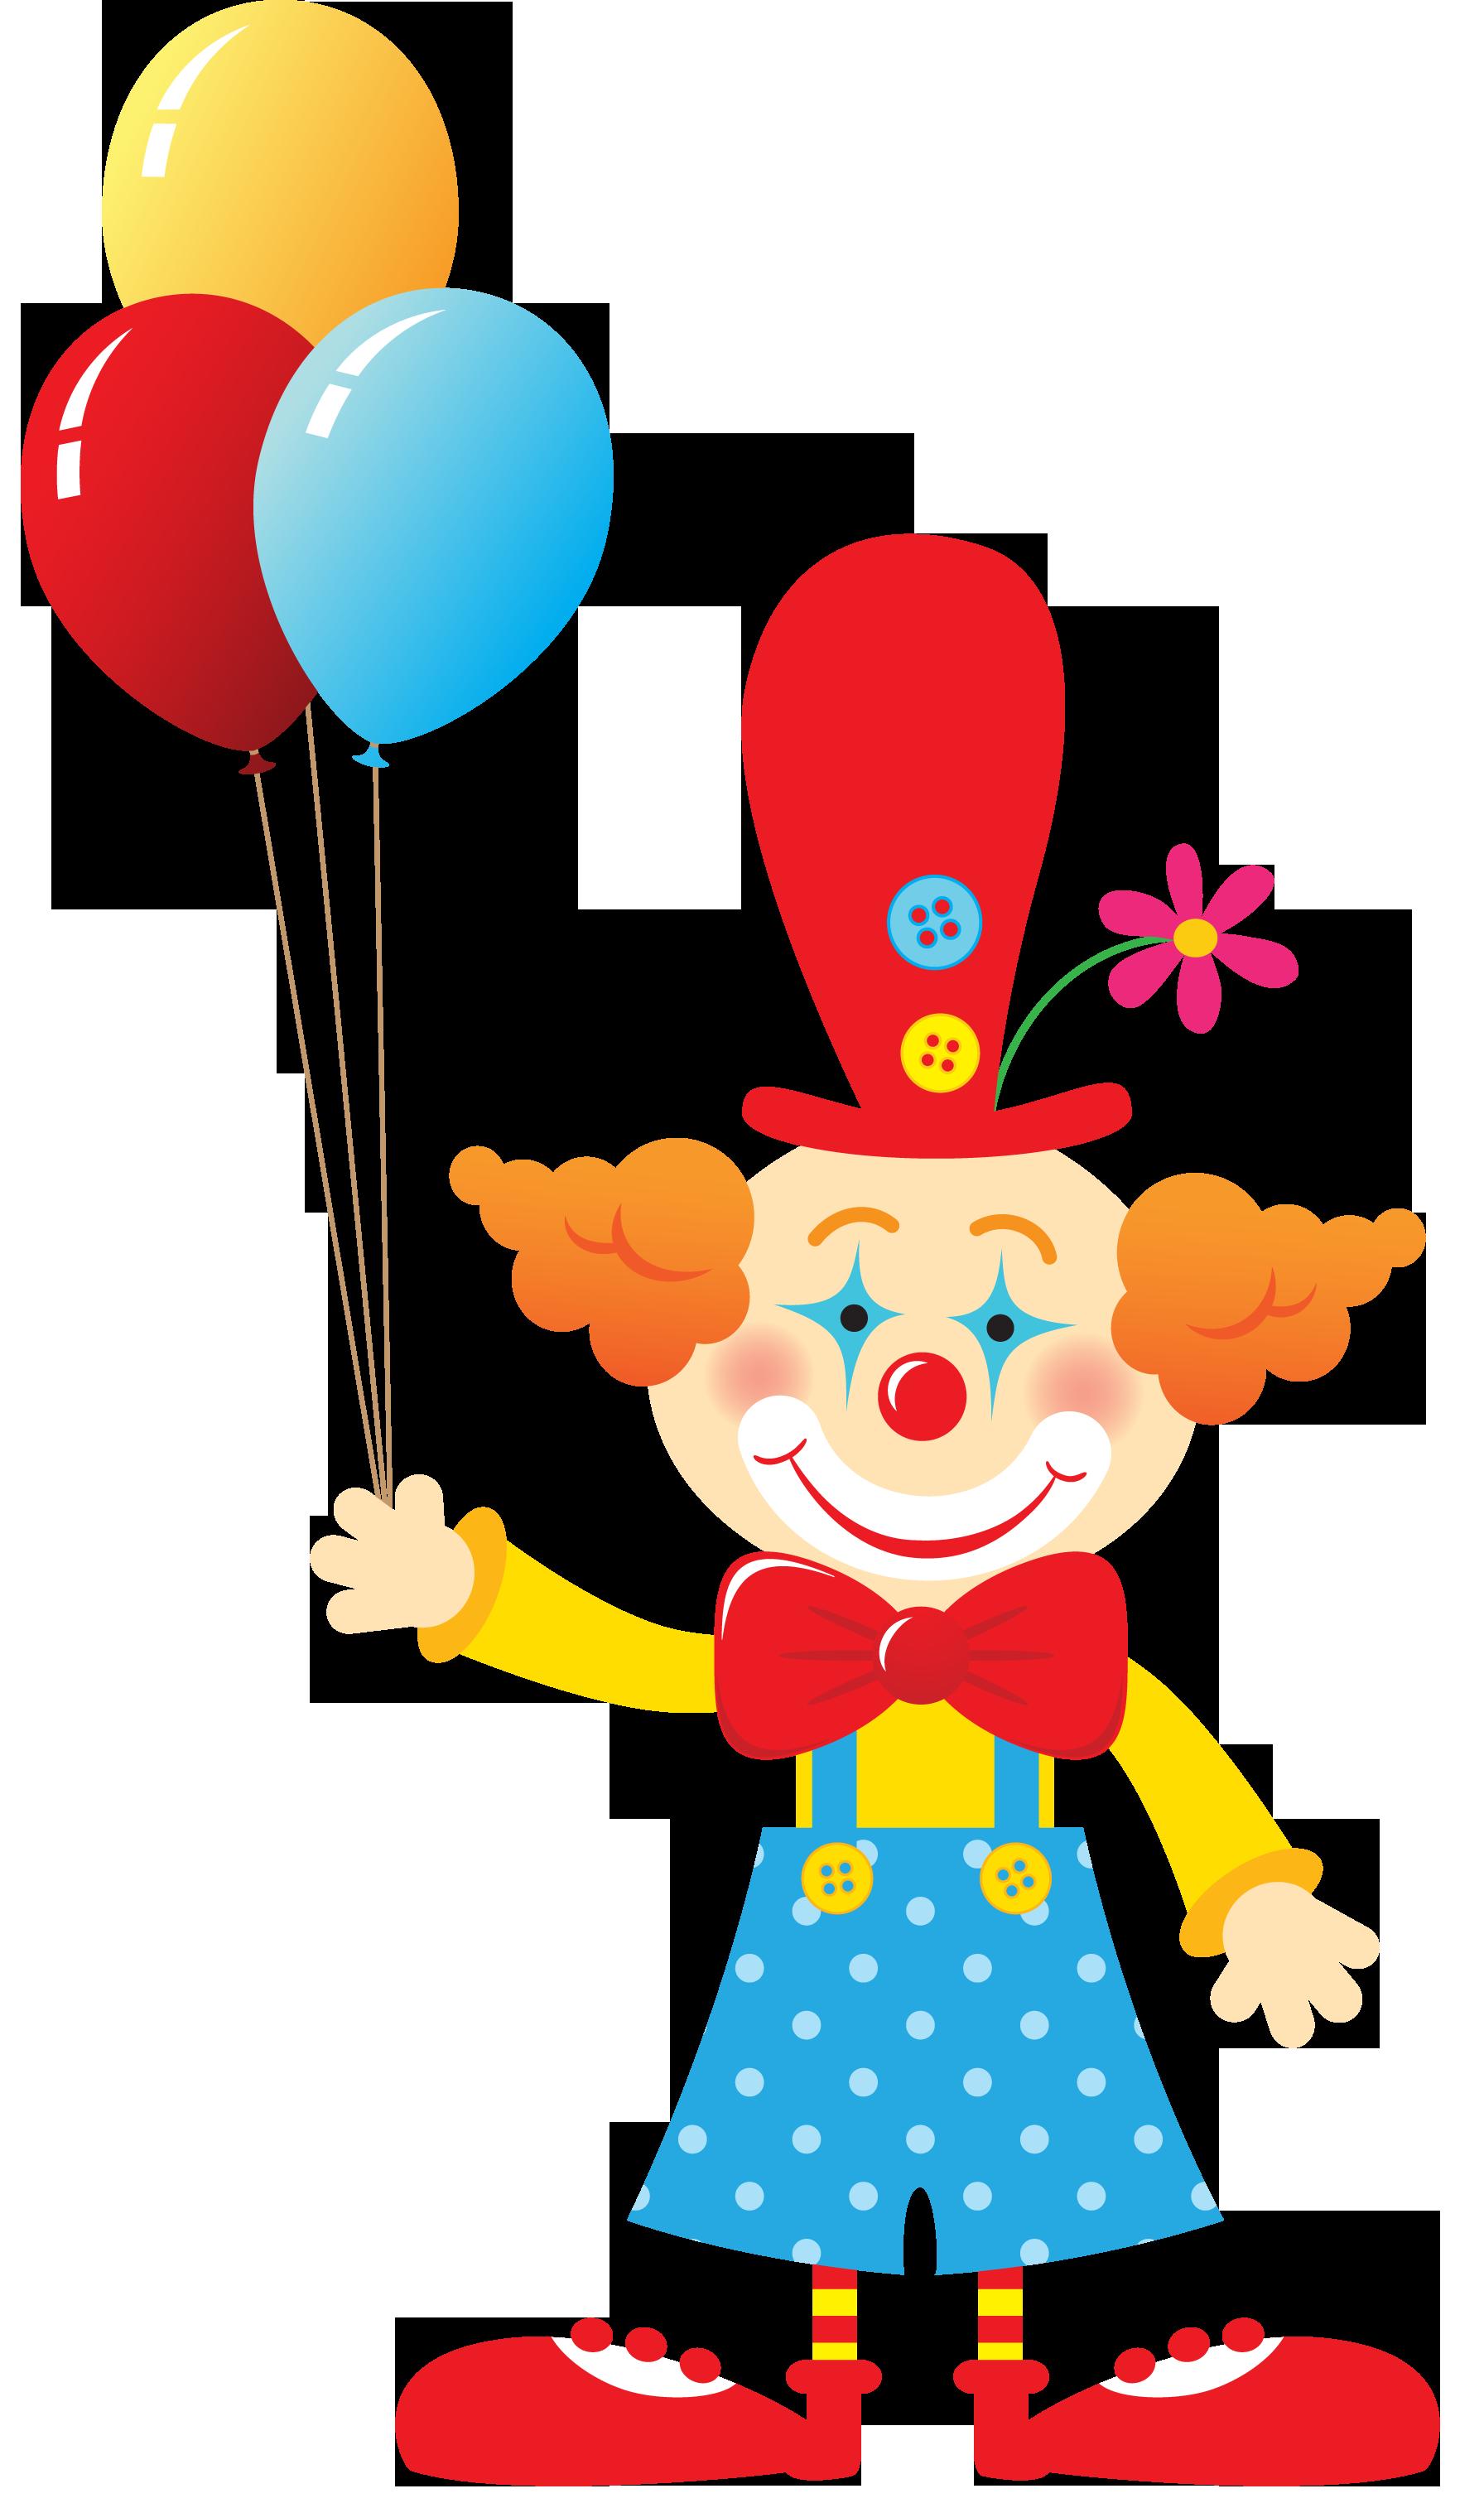 jpg stock Photo by danimfalcao minus. Happy clown clipart